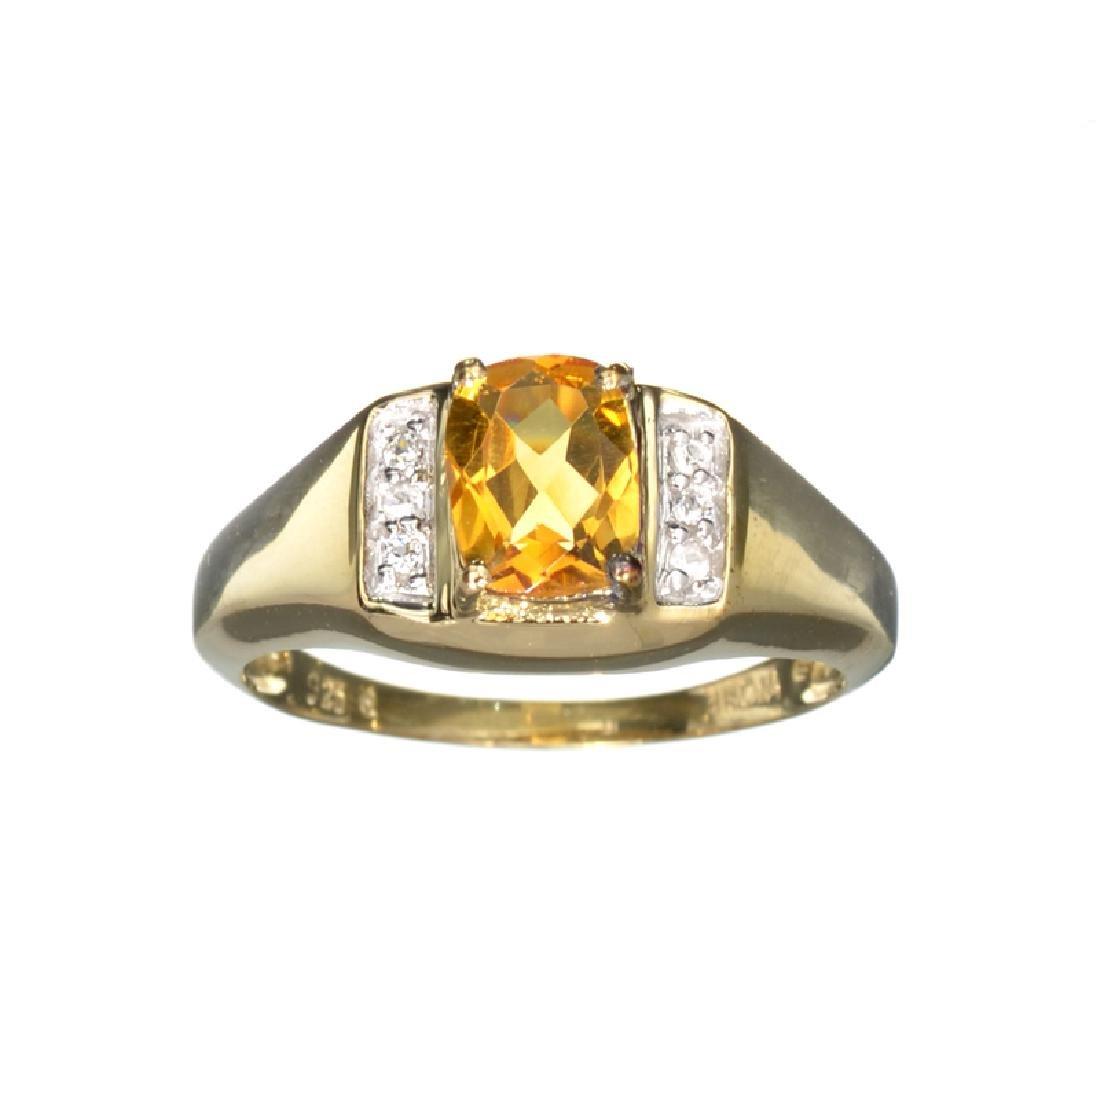 APP: 0.4k Fine Jewelry 1.38CT Citrine And White